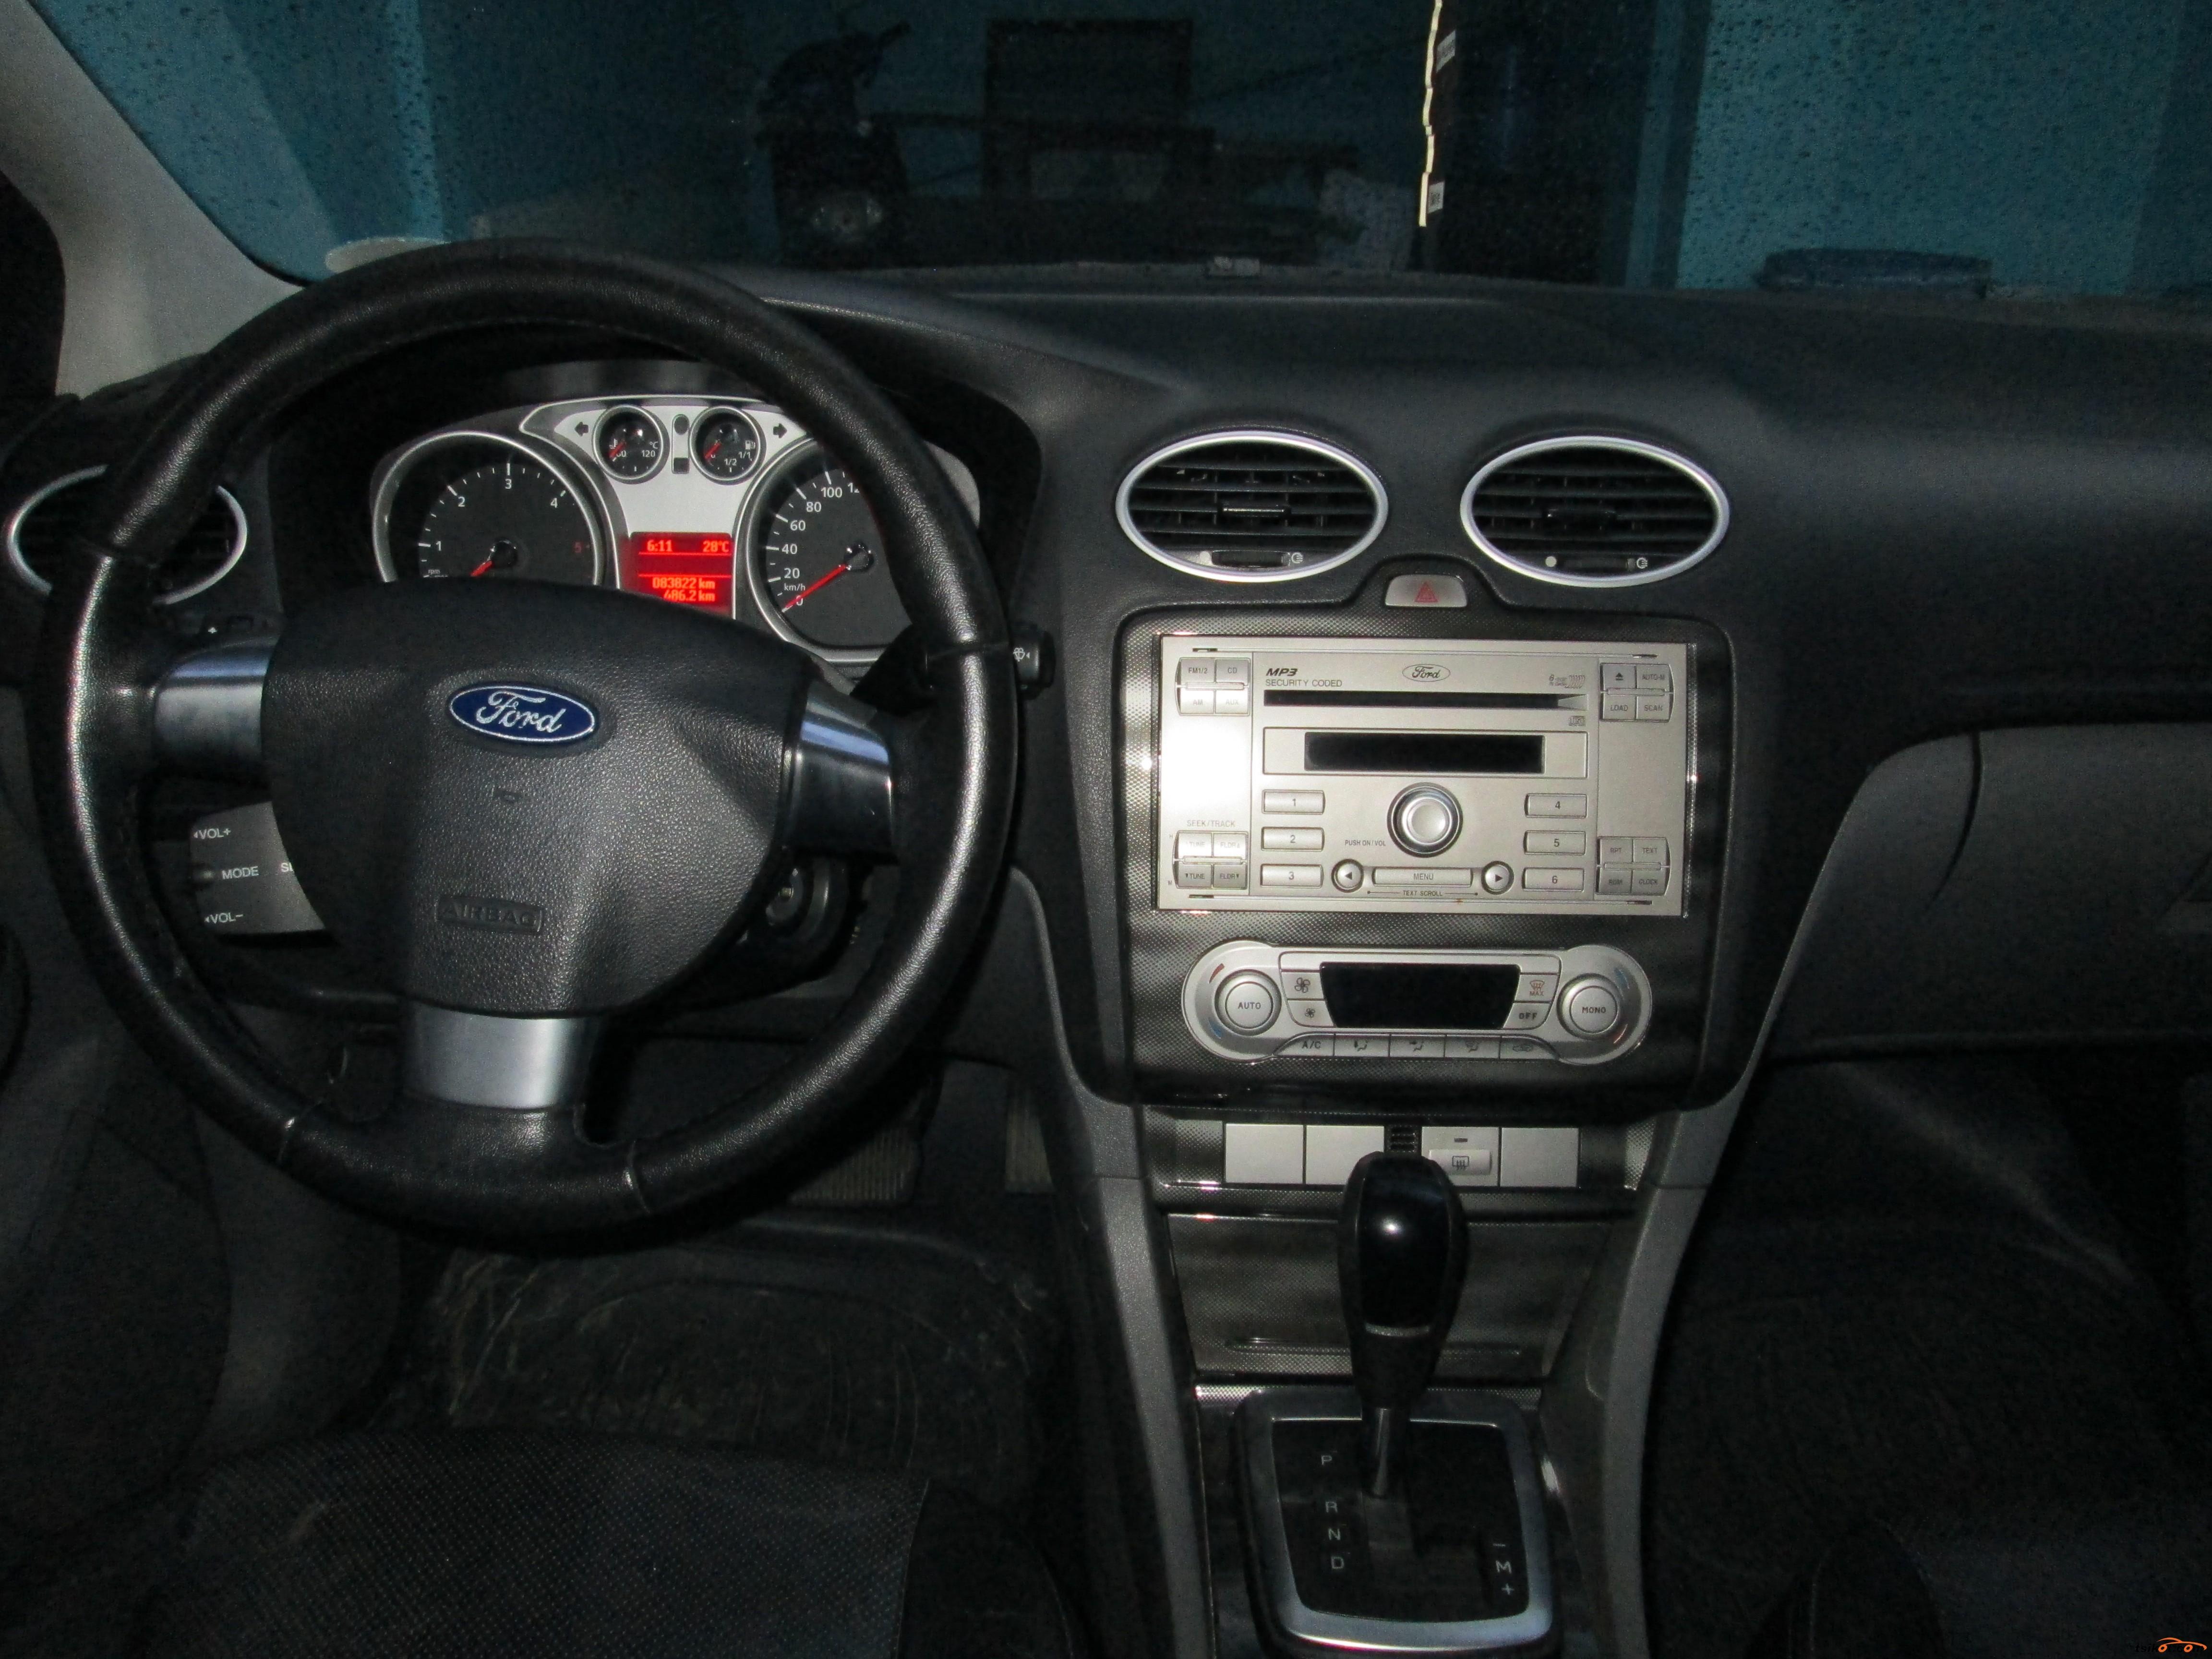 Ford Focus 2012 - 6